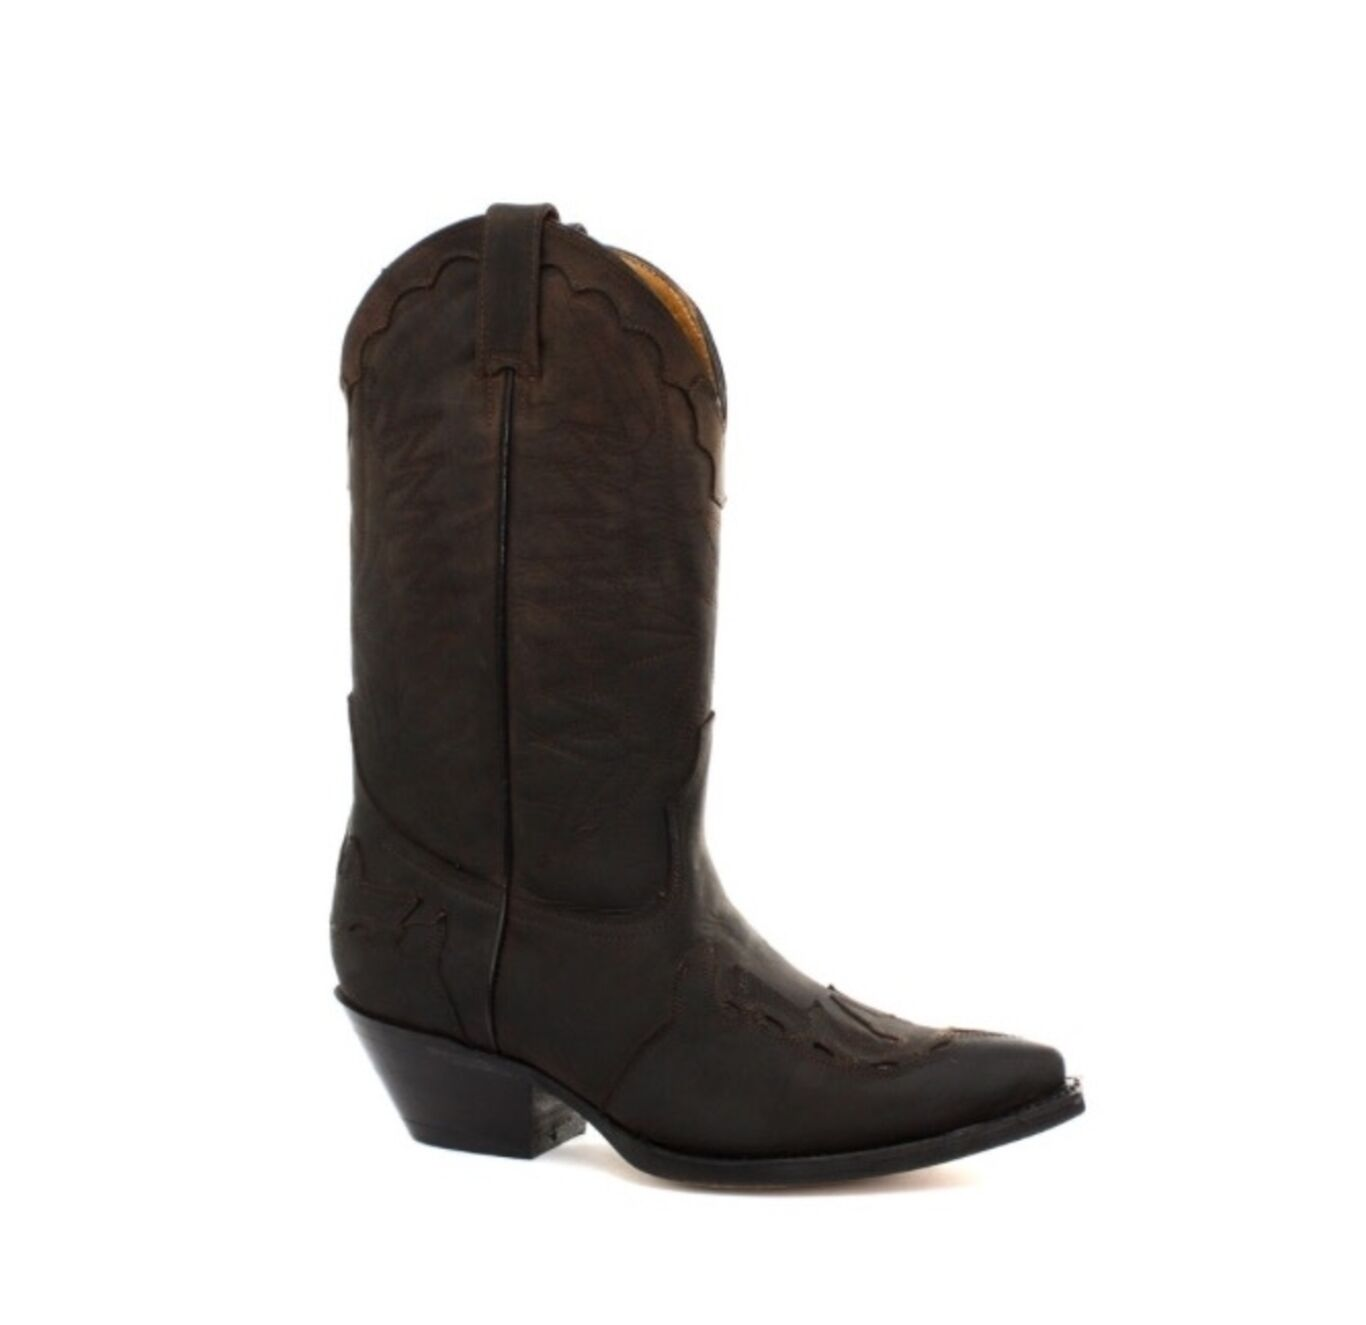 Grinders  Uomo Classic Cowboy Cowboy Cowboy Stiefel Real Leder Stylish Look  - Arizona HI 00e667